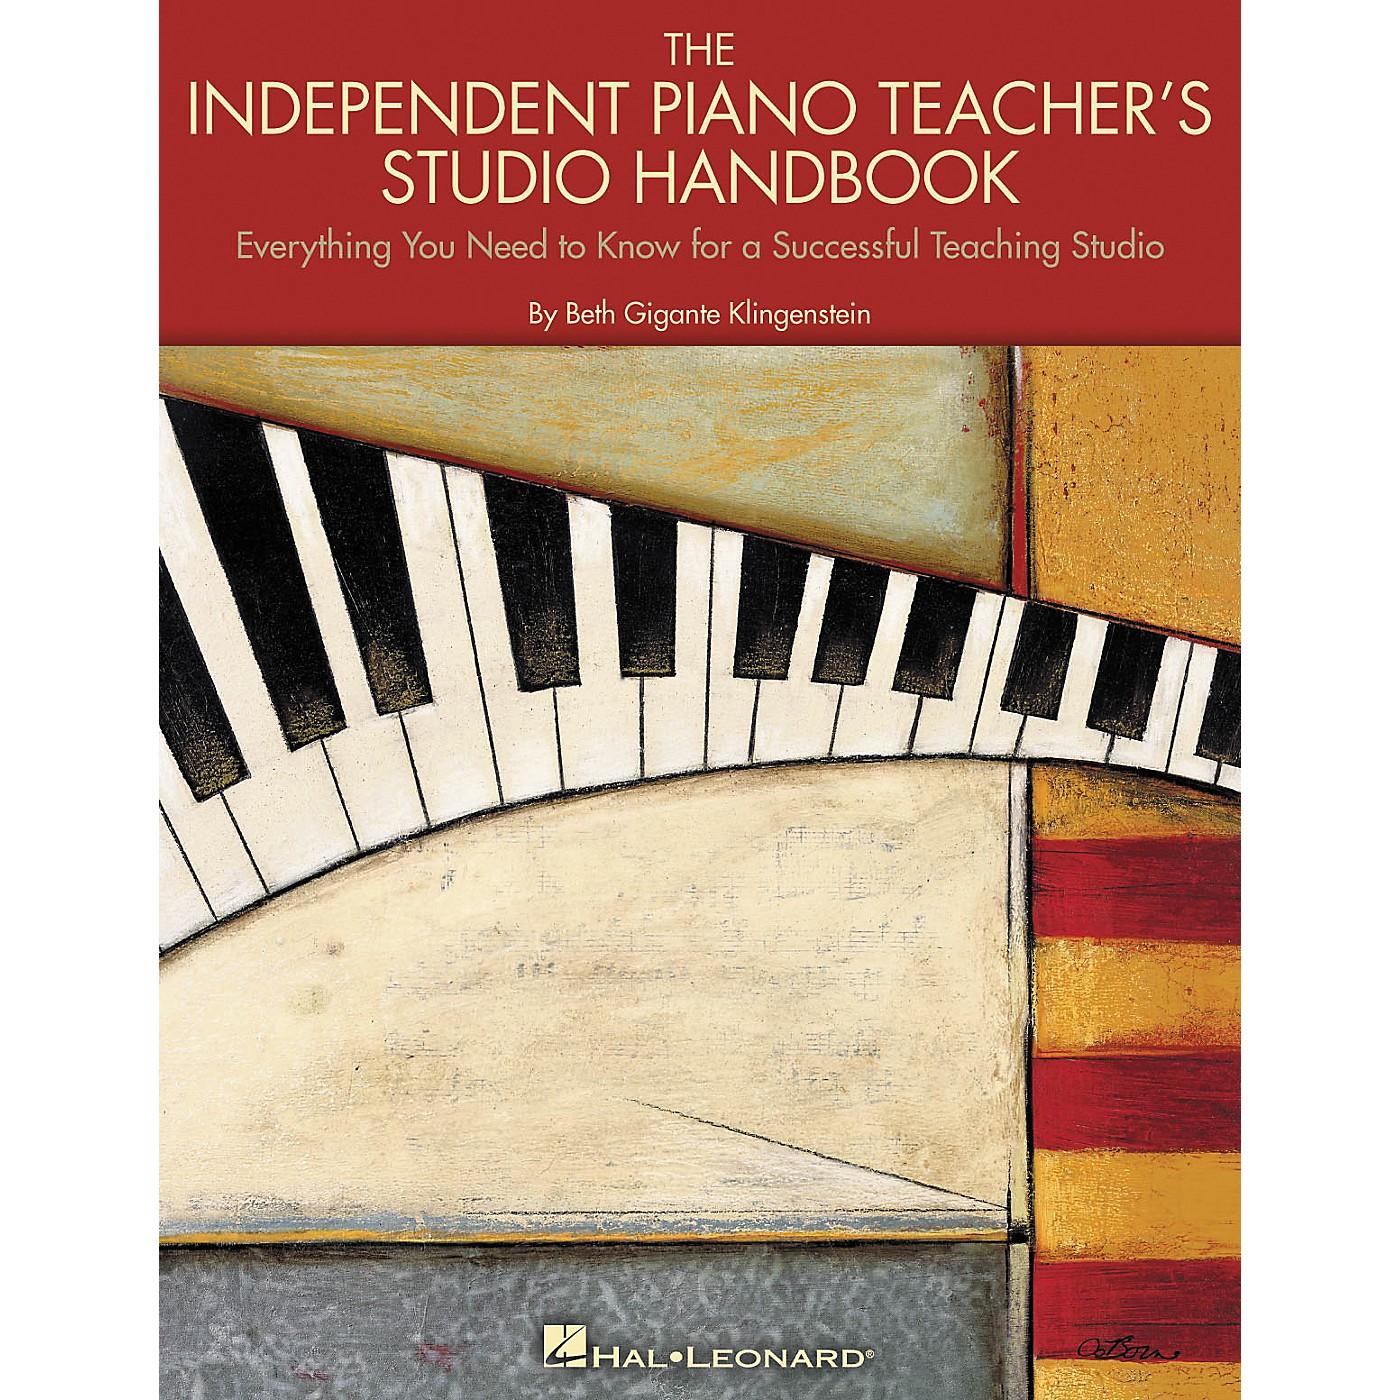 Hal Leonard The Independent Piano Teacher's Studio Handbook thumbnail